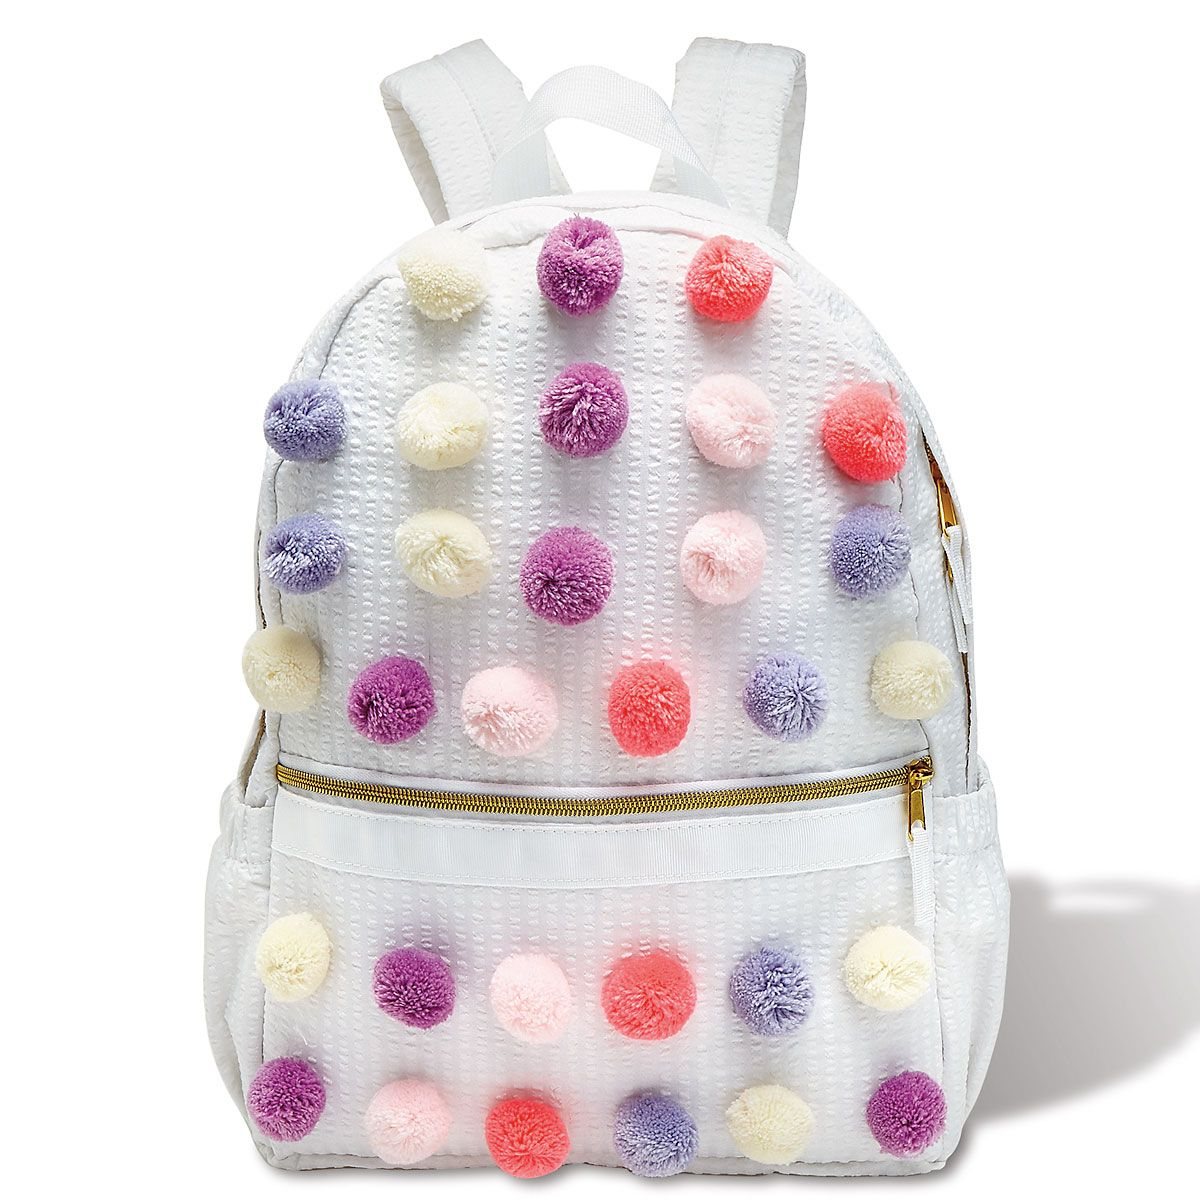 Pastel Pom Poms Backpack